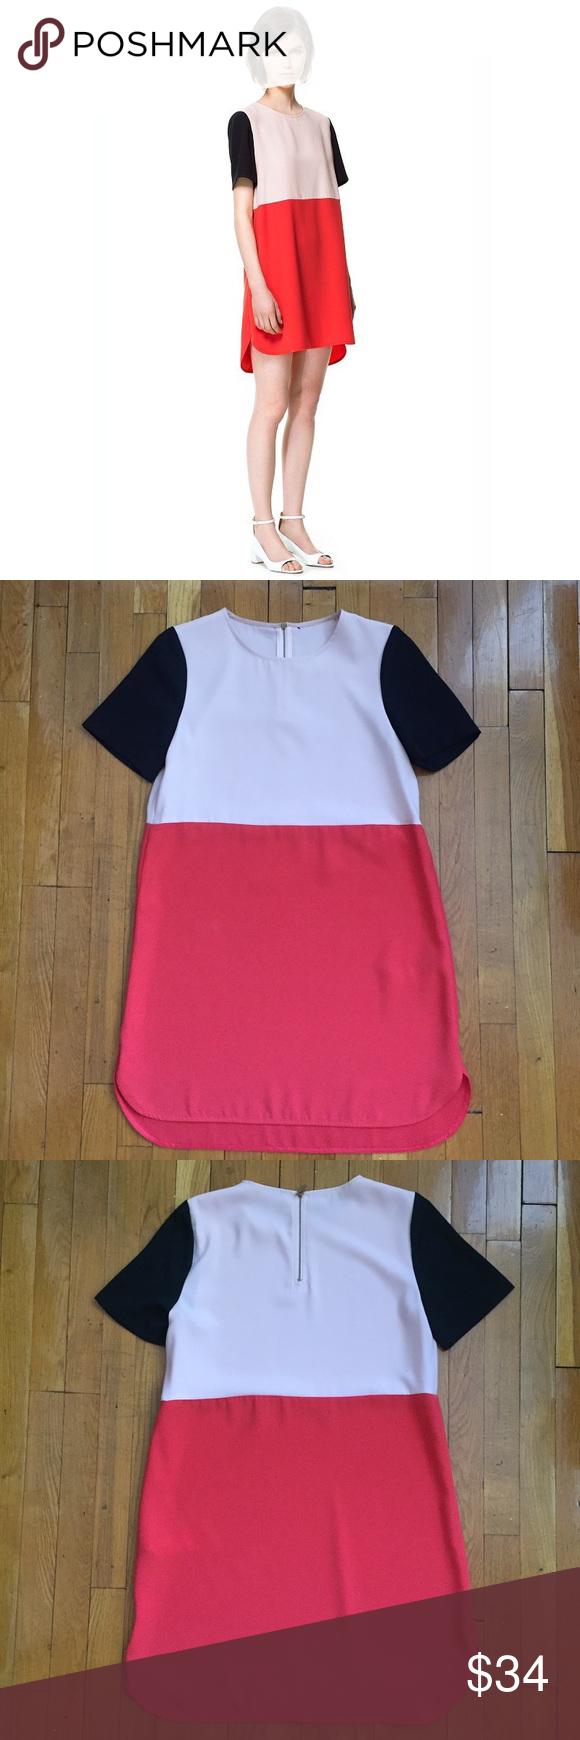 Zara colorblock mini dress zara dresses mini dresses and color